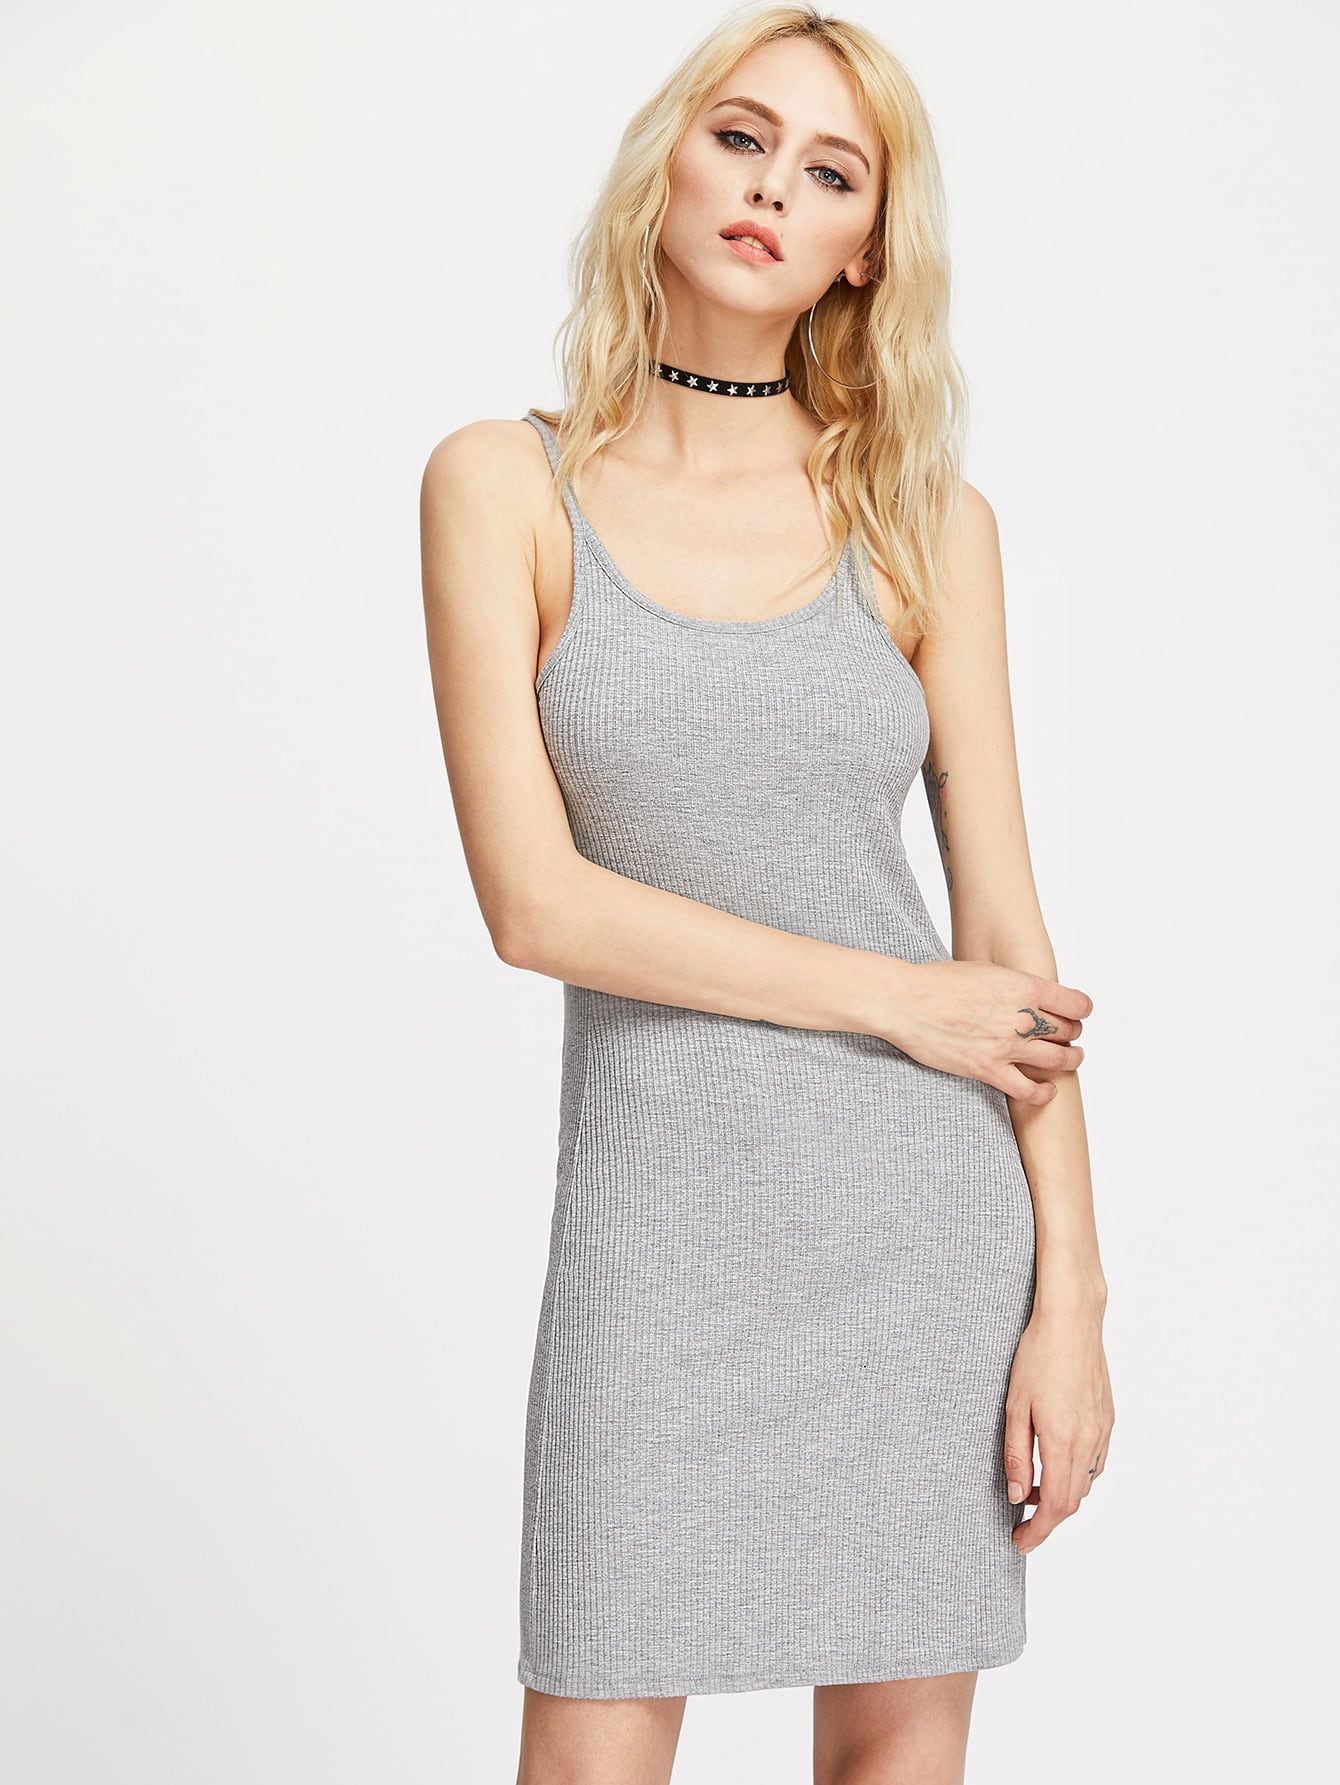 Ribbed Cami Dress dress170403452